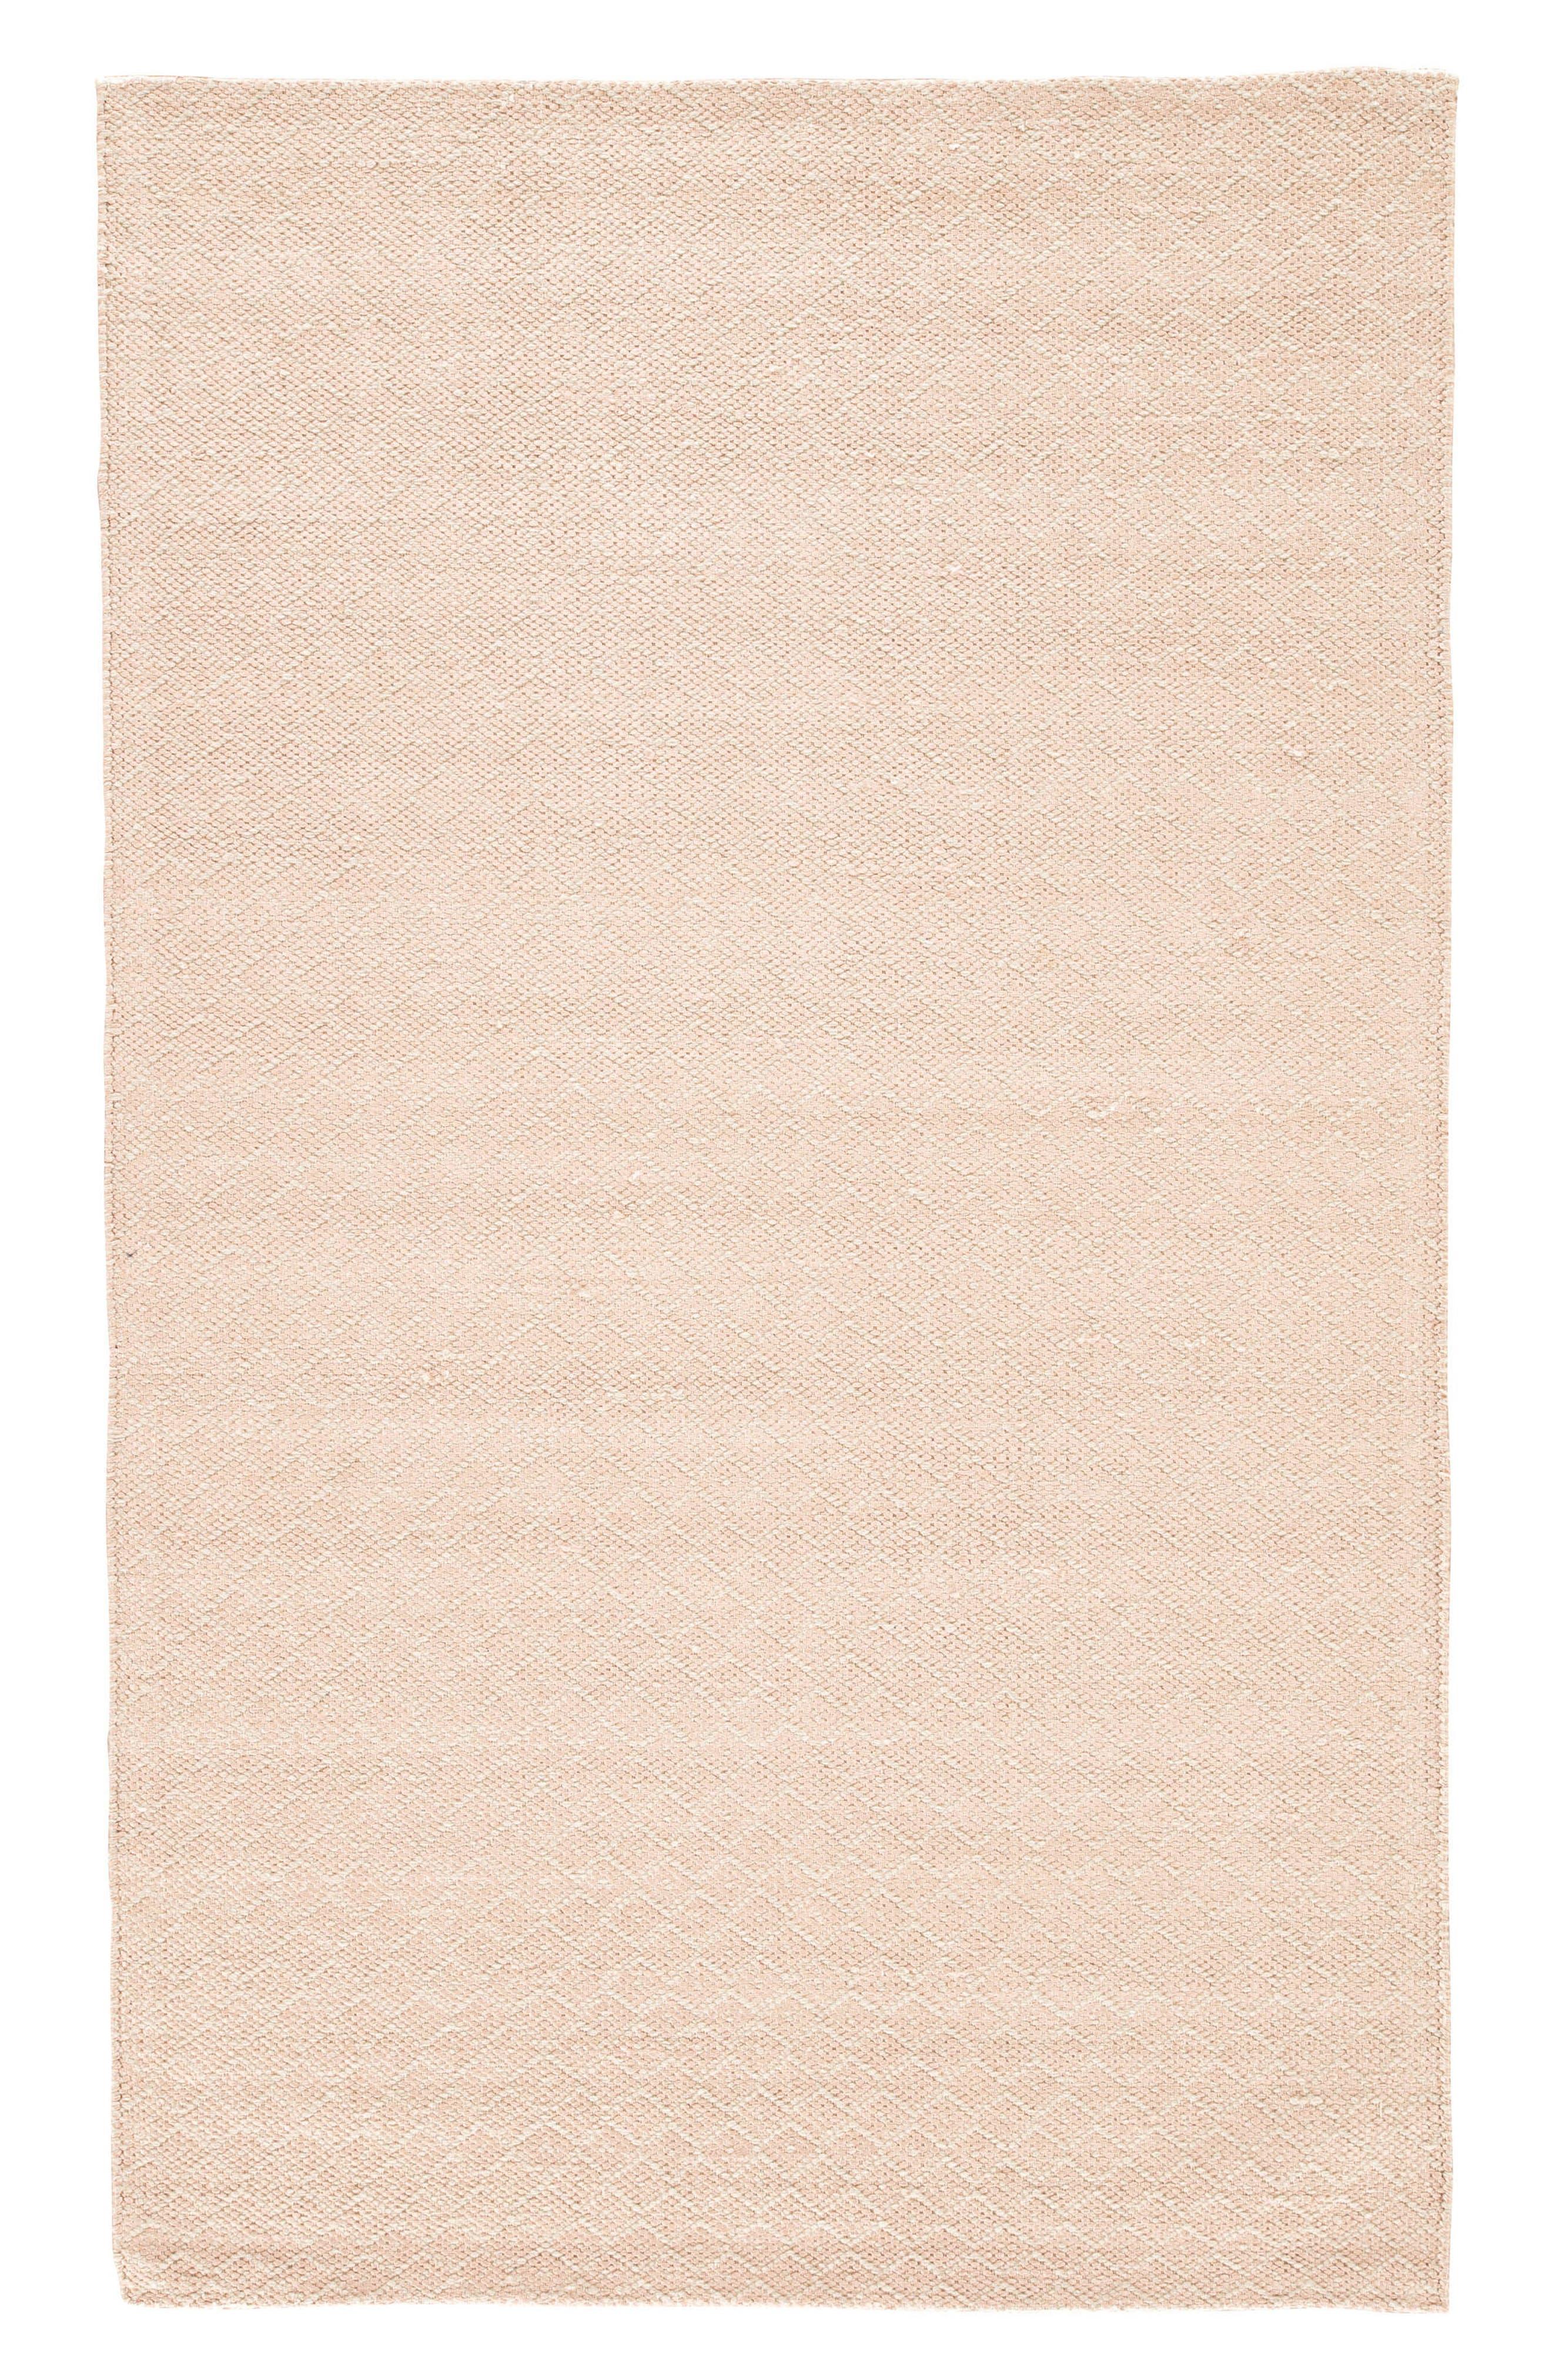 Rainier Rug,                             Main thumbnail 1, color,                             250